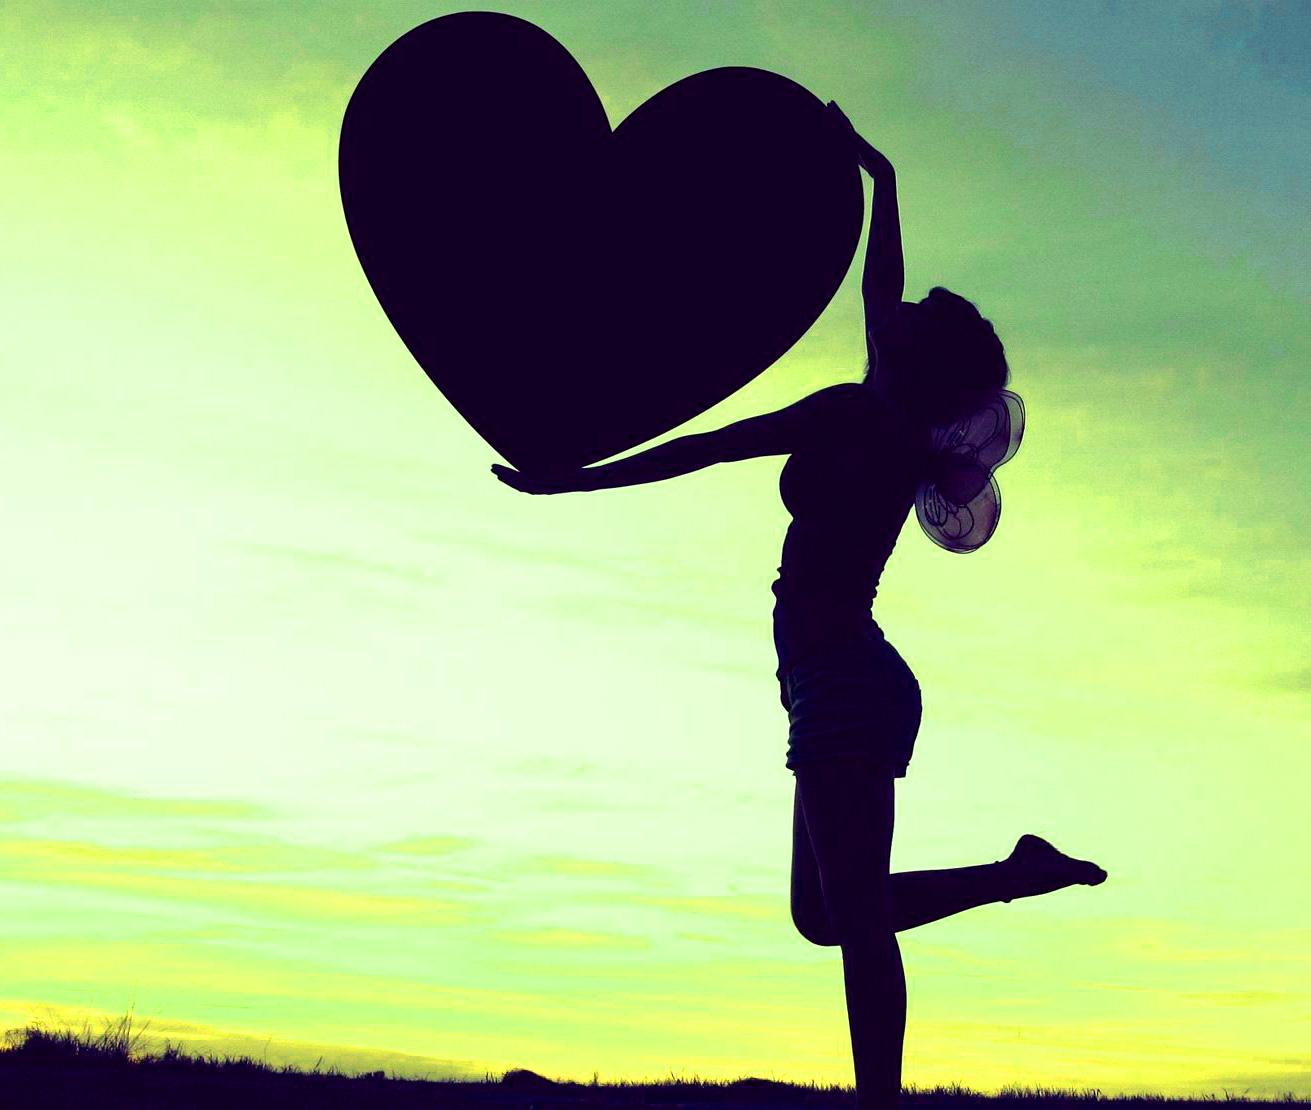 Best whatsapp dp for love